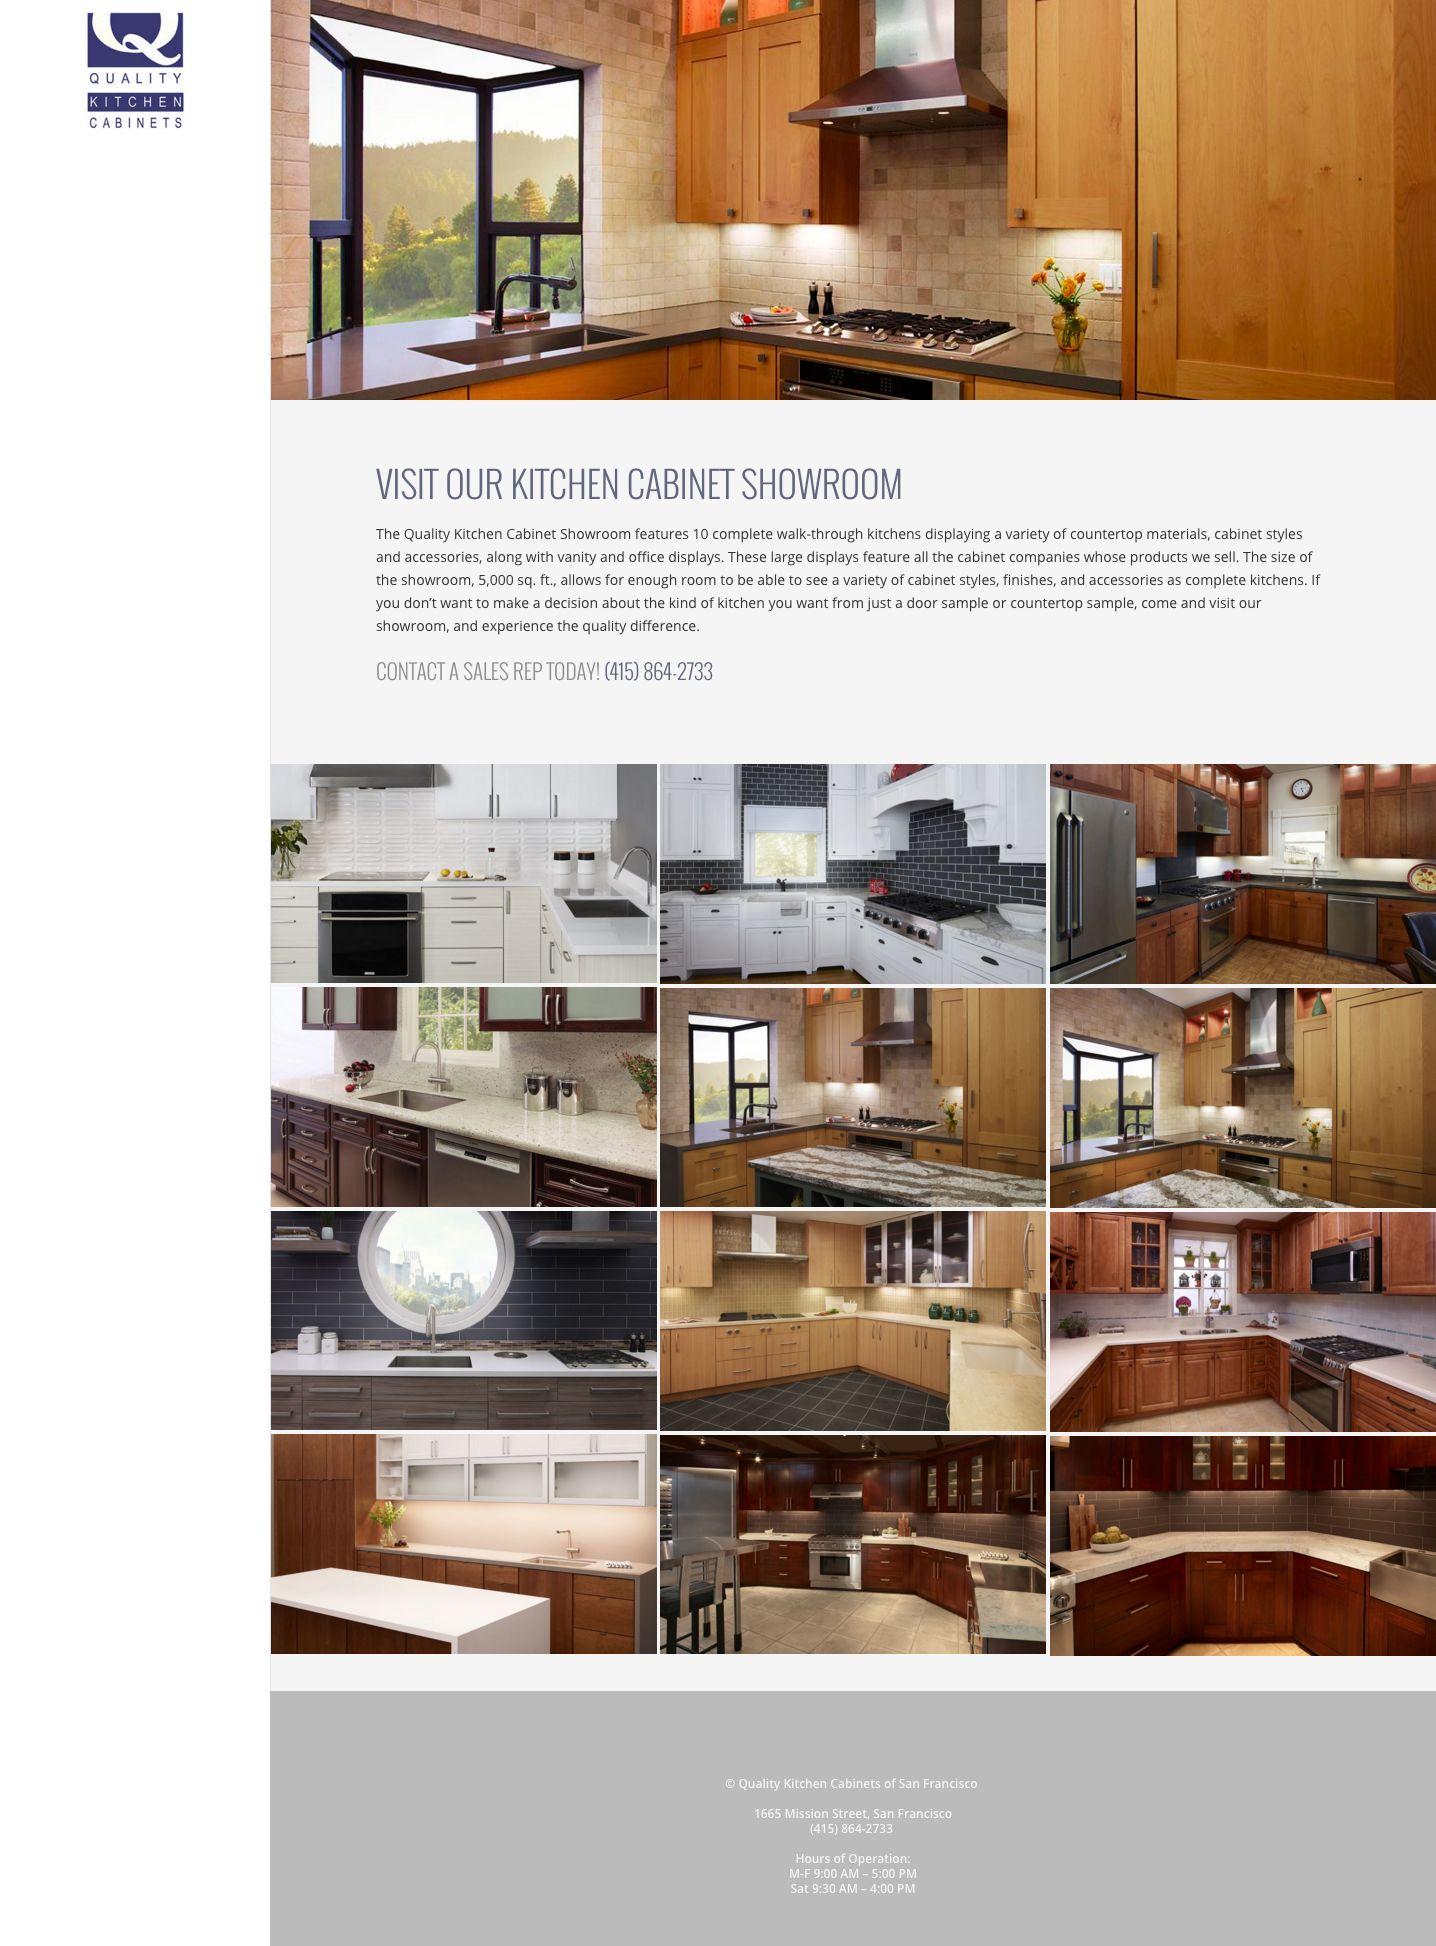 ... WordPress Website Design Company San Francisco Quality Kitchen